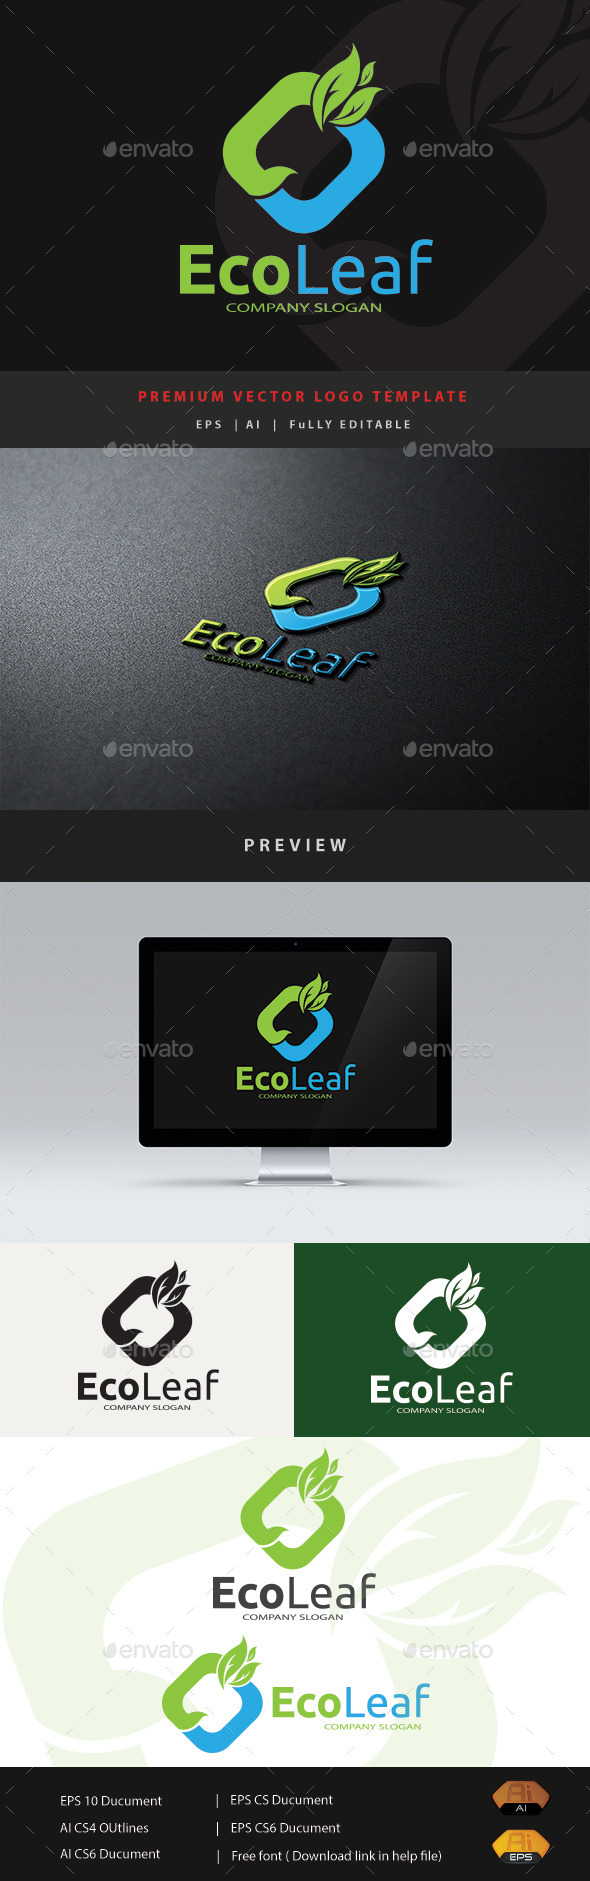 GraphicRiver Eco Leaf 11787192